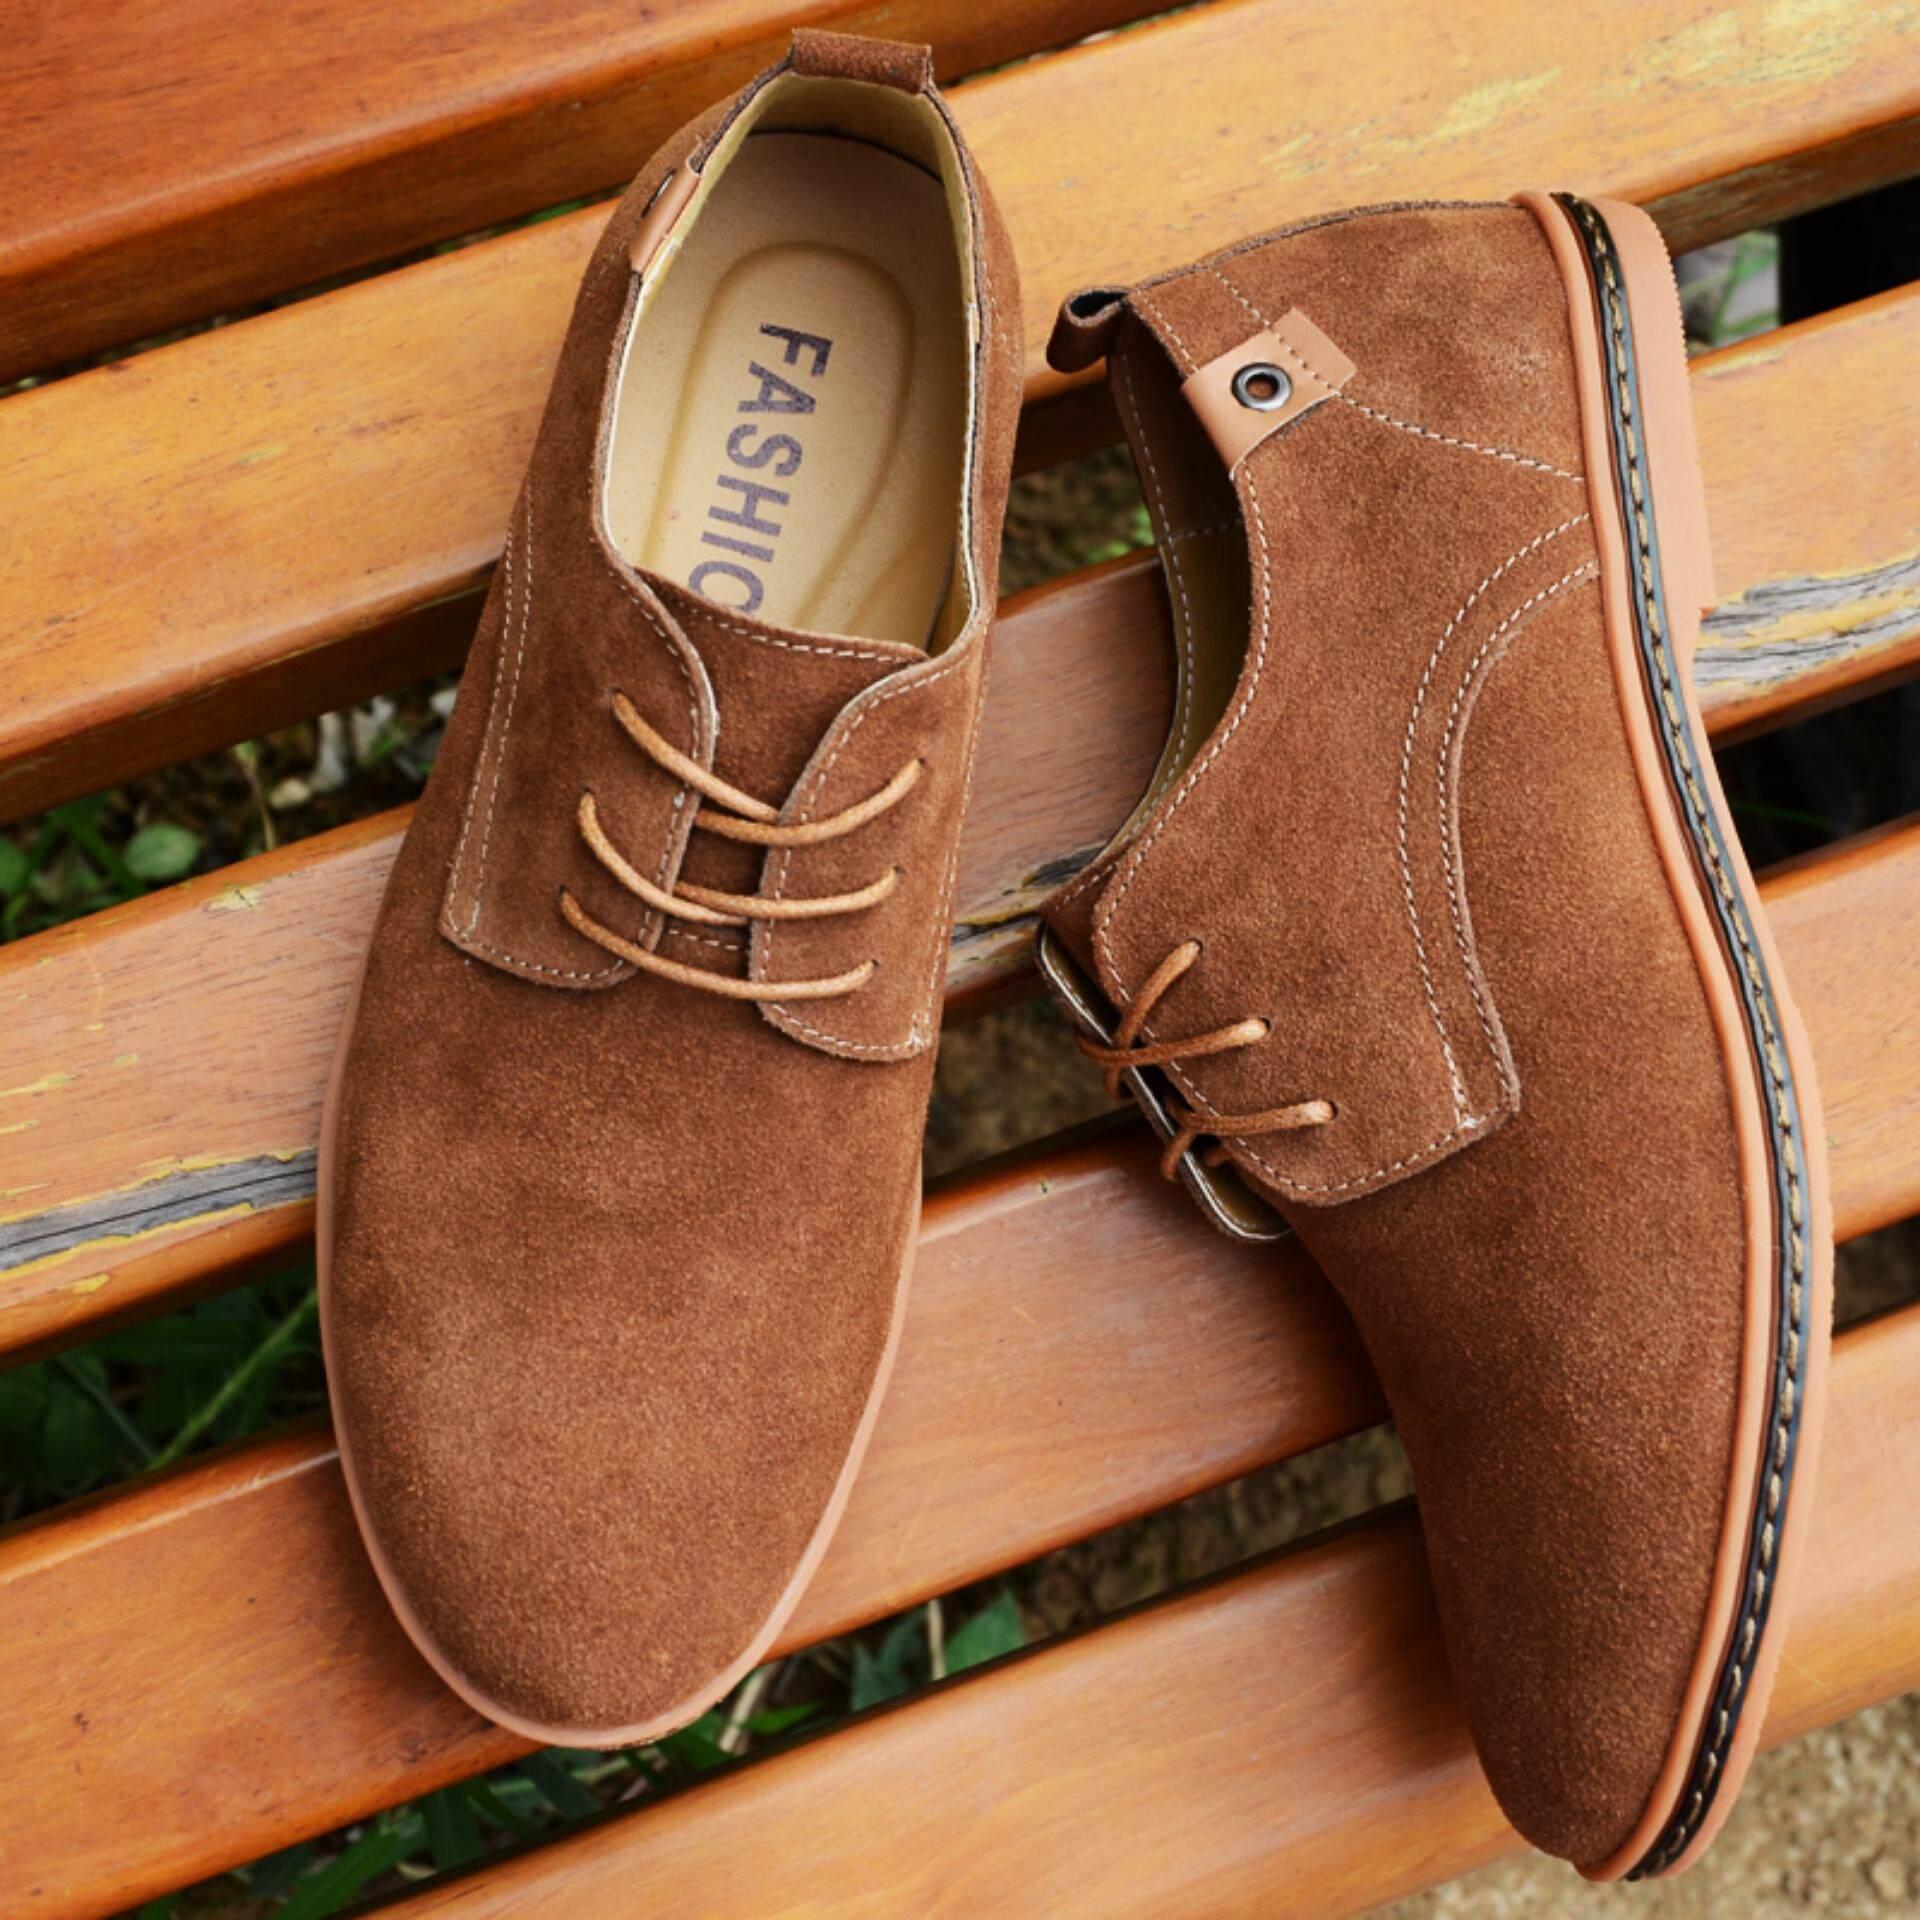 Yealon Pria Sepatu Kasual Suede Kulit Sepatu Pria Pantofel Sneakers Kasual Asli Kulit Datar Sepatu Pria Sneakers Sepatu Bot untuk Pria Oxford Besar Ukuran 38-48-Internasional